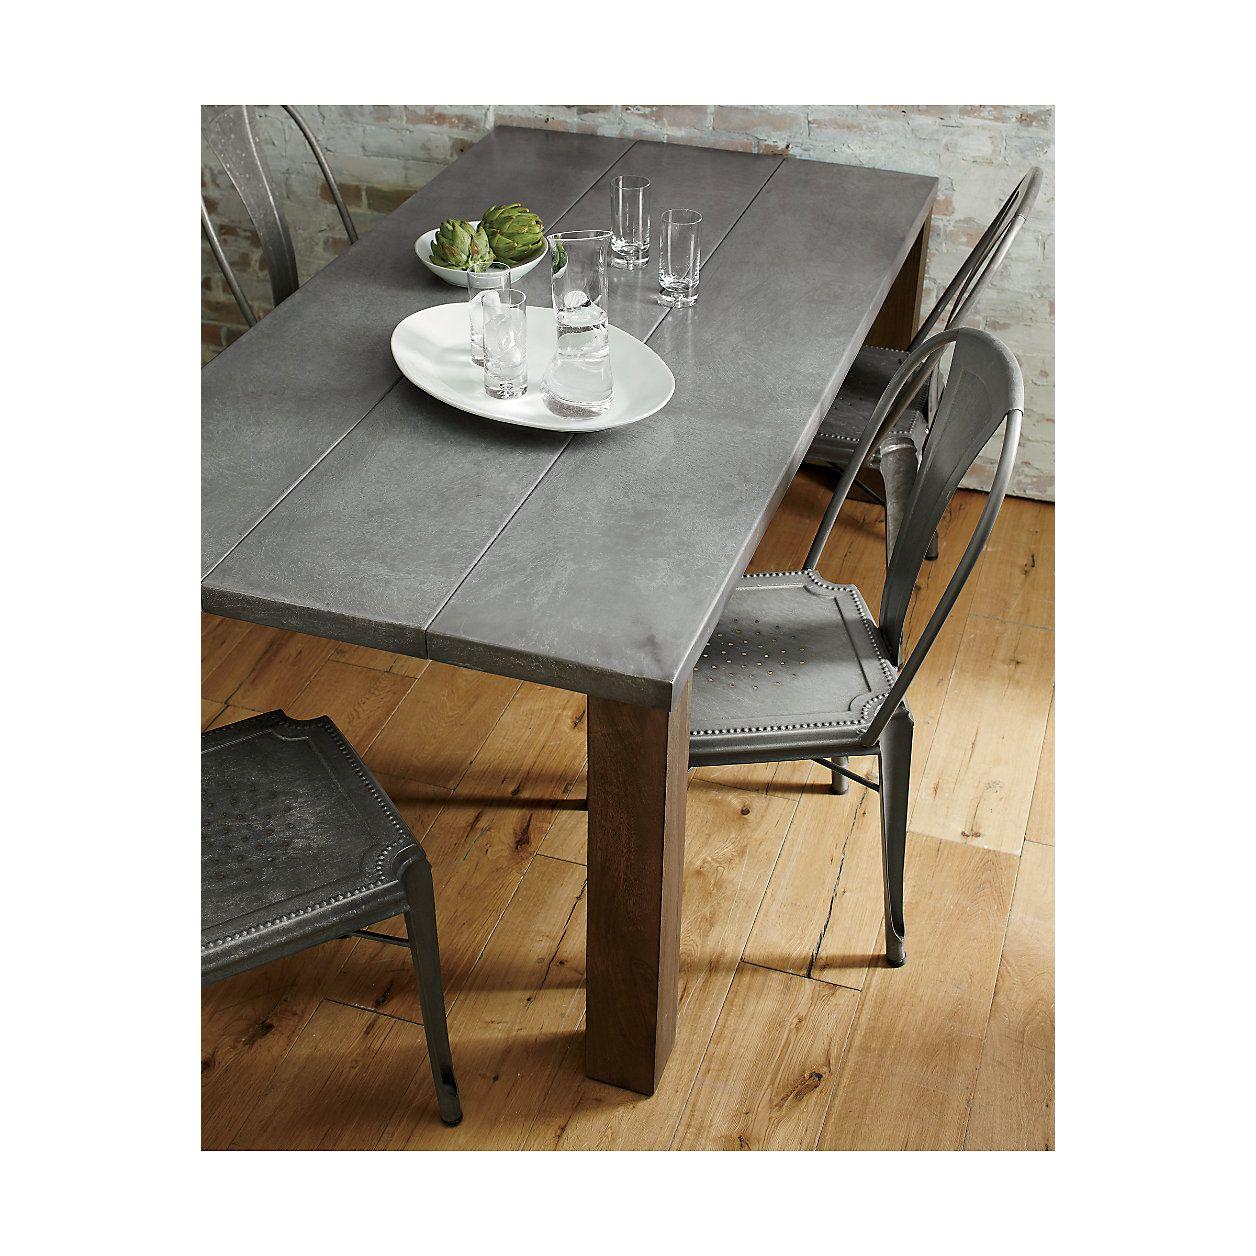 Crate And Barrel Dakota Table Live Edge Oak With Fumed Finish Needs Protective Topcoat Metal Dining Chairs Dining Table Dining Table Gold